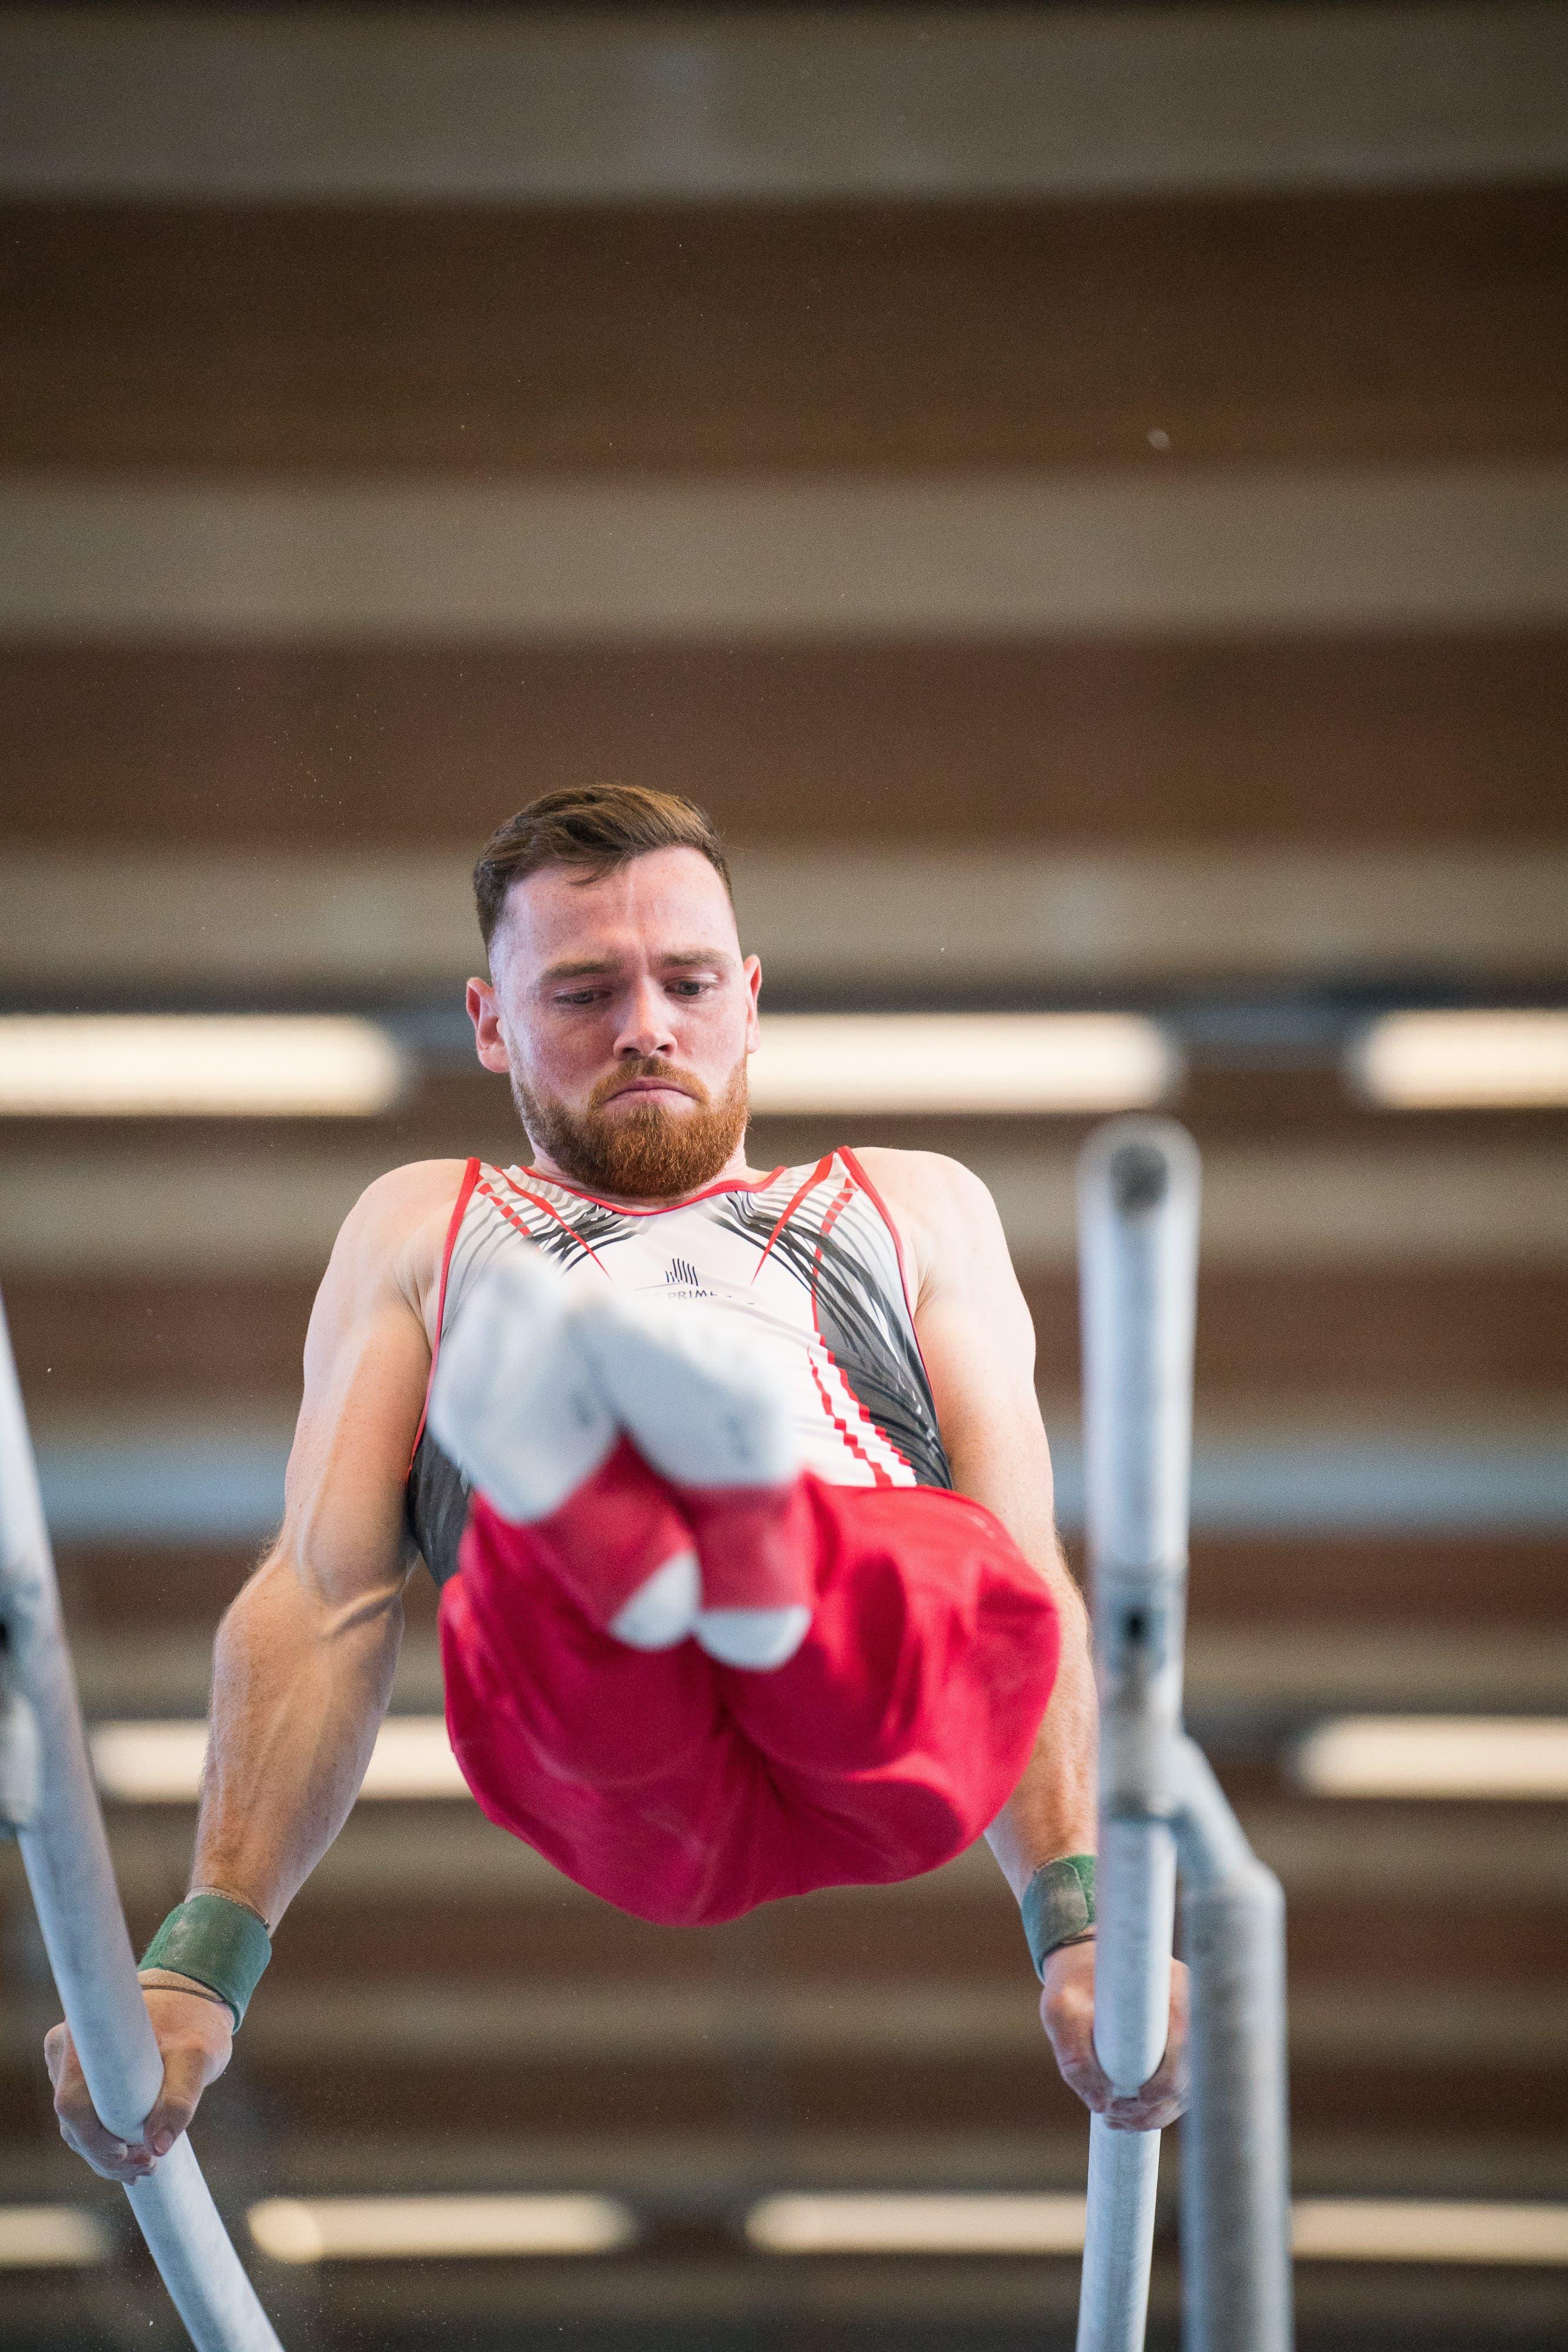 Benjamin Gischard während seine Übung am Barren an der Schweizer Meisterschaft in Kirchberg.